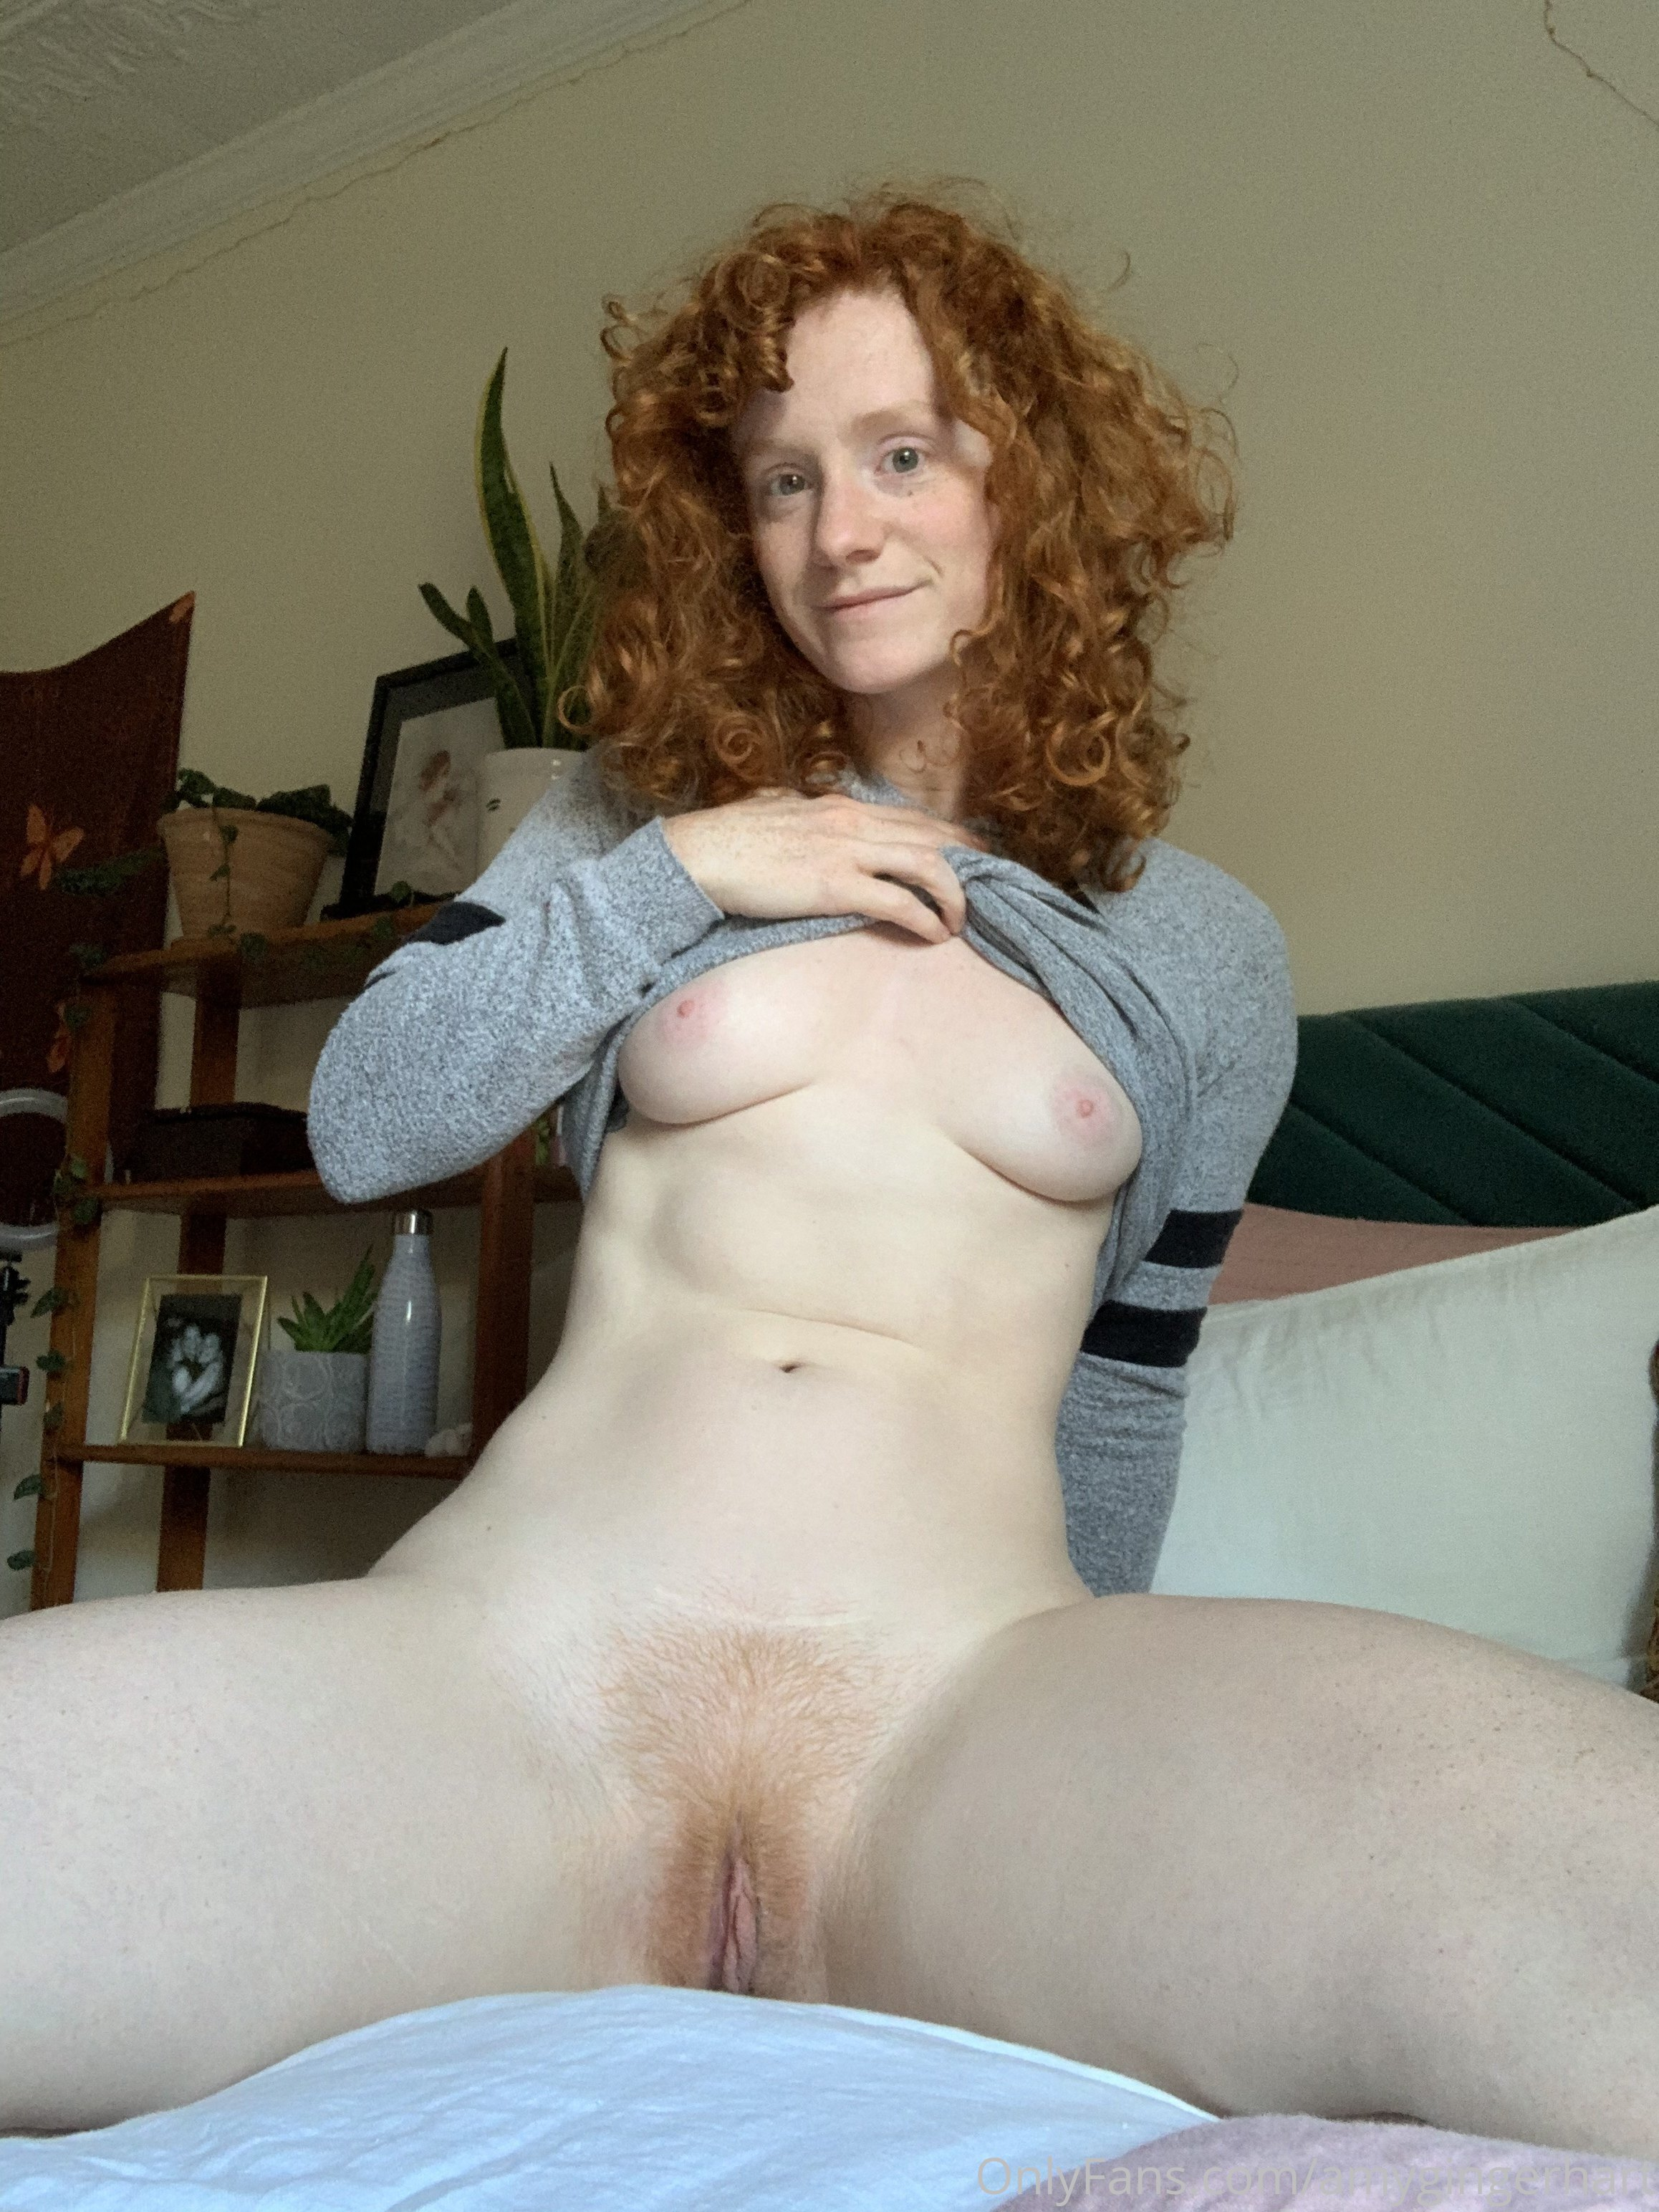 Amy Hart, Amygingerhart, Onlyfans 0272